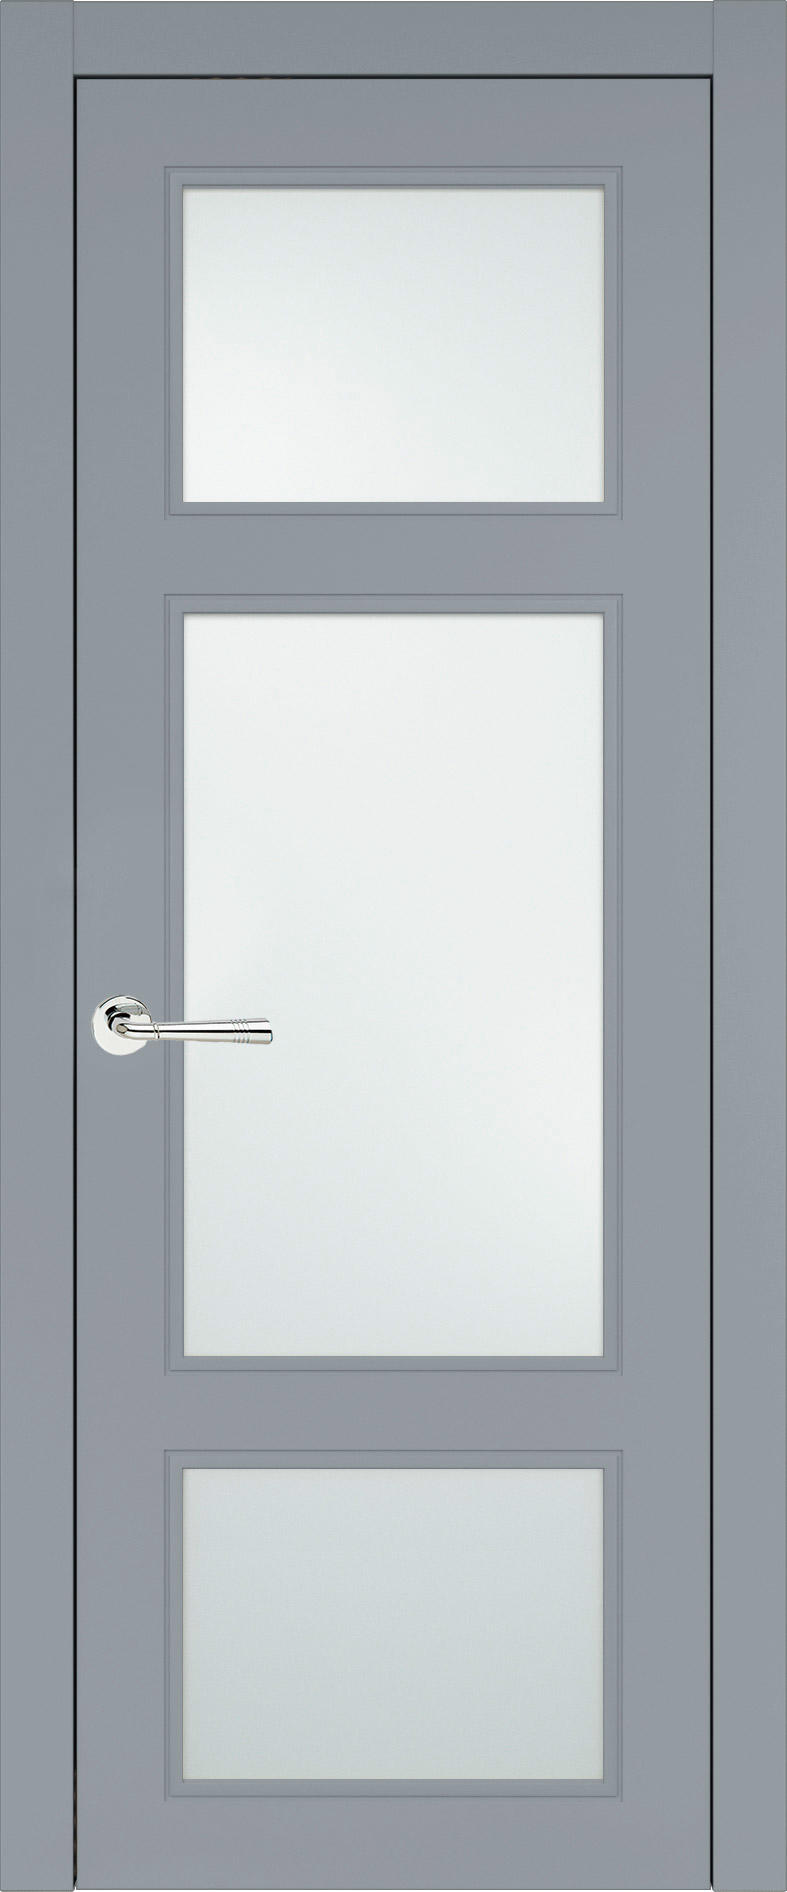 Siena Neo Classic цвет - Серебристо-серая эмаль (RAL 7045) Со стеклом (ДО)